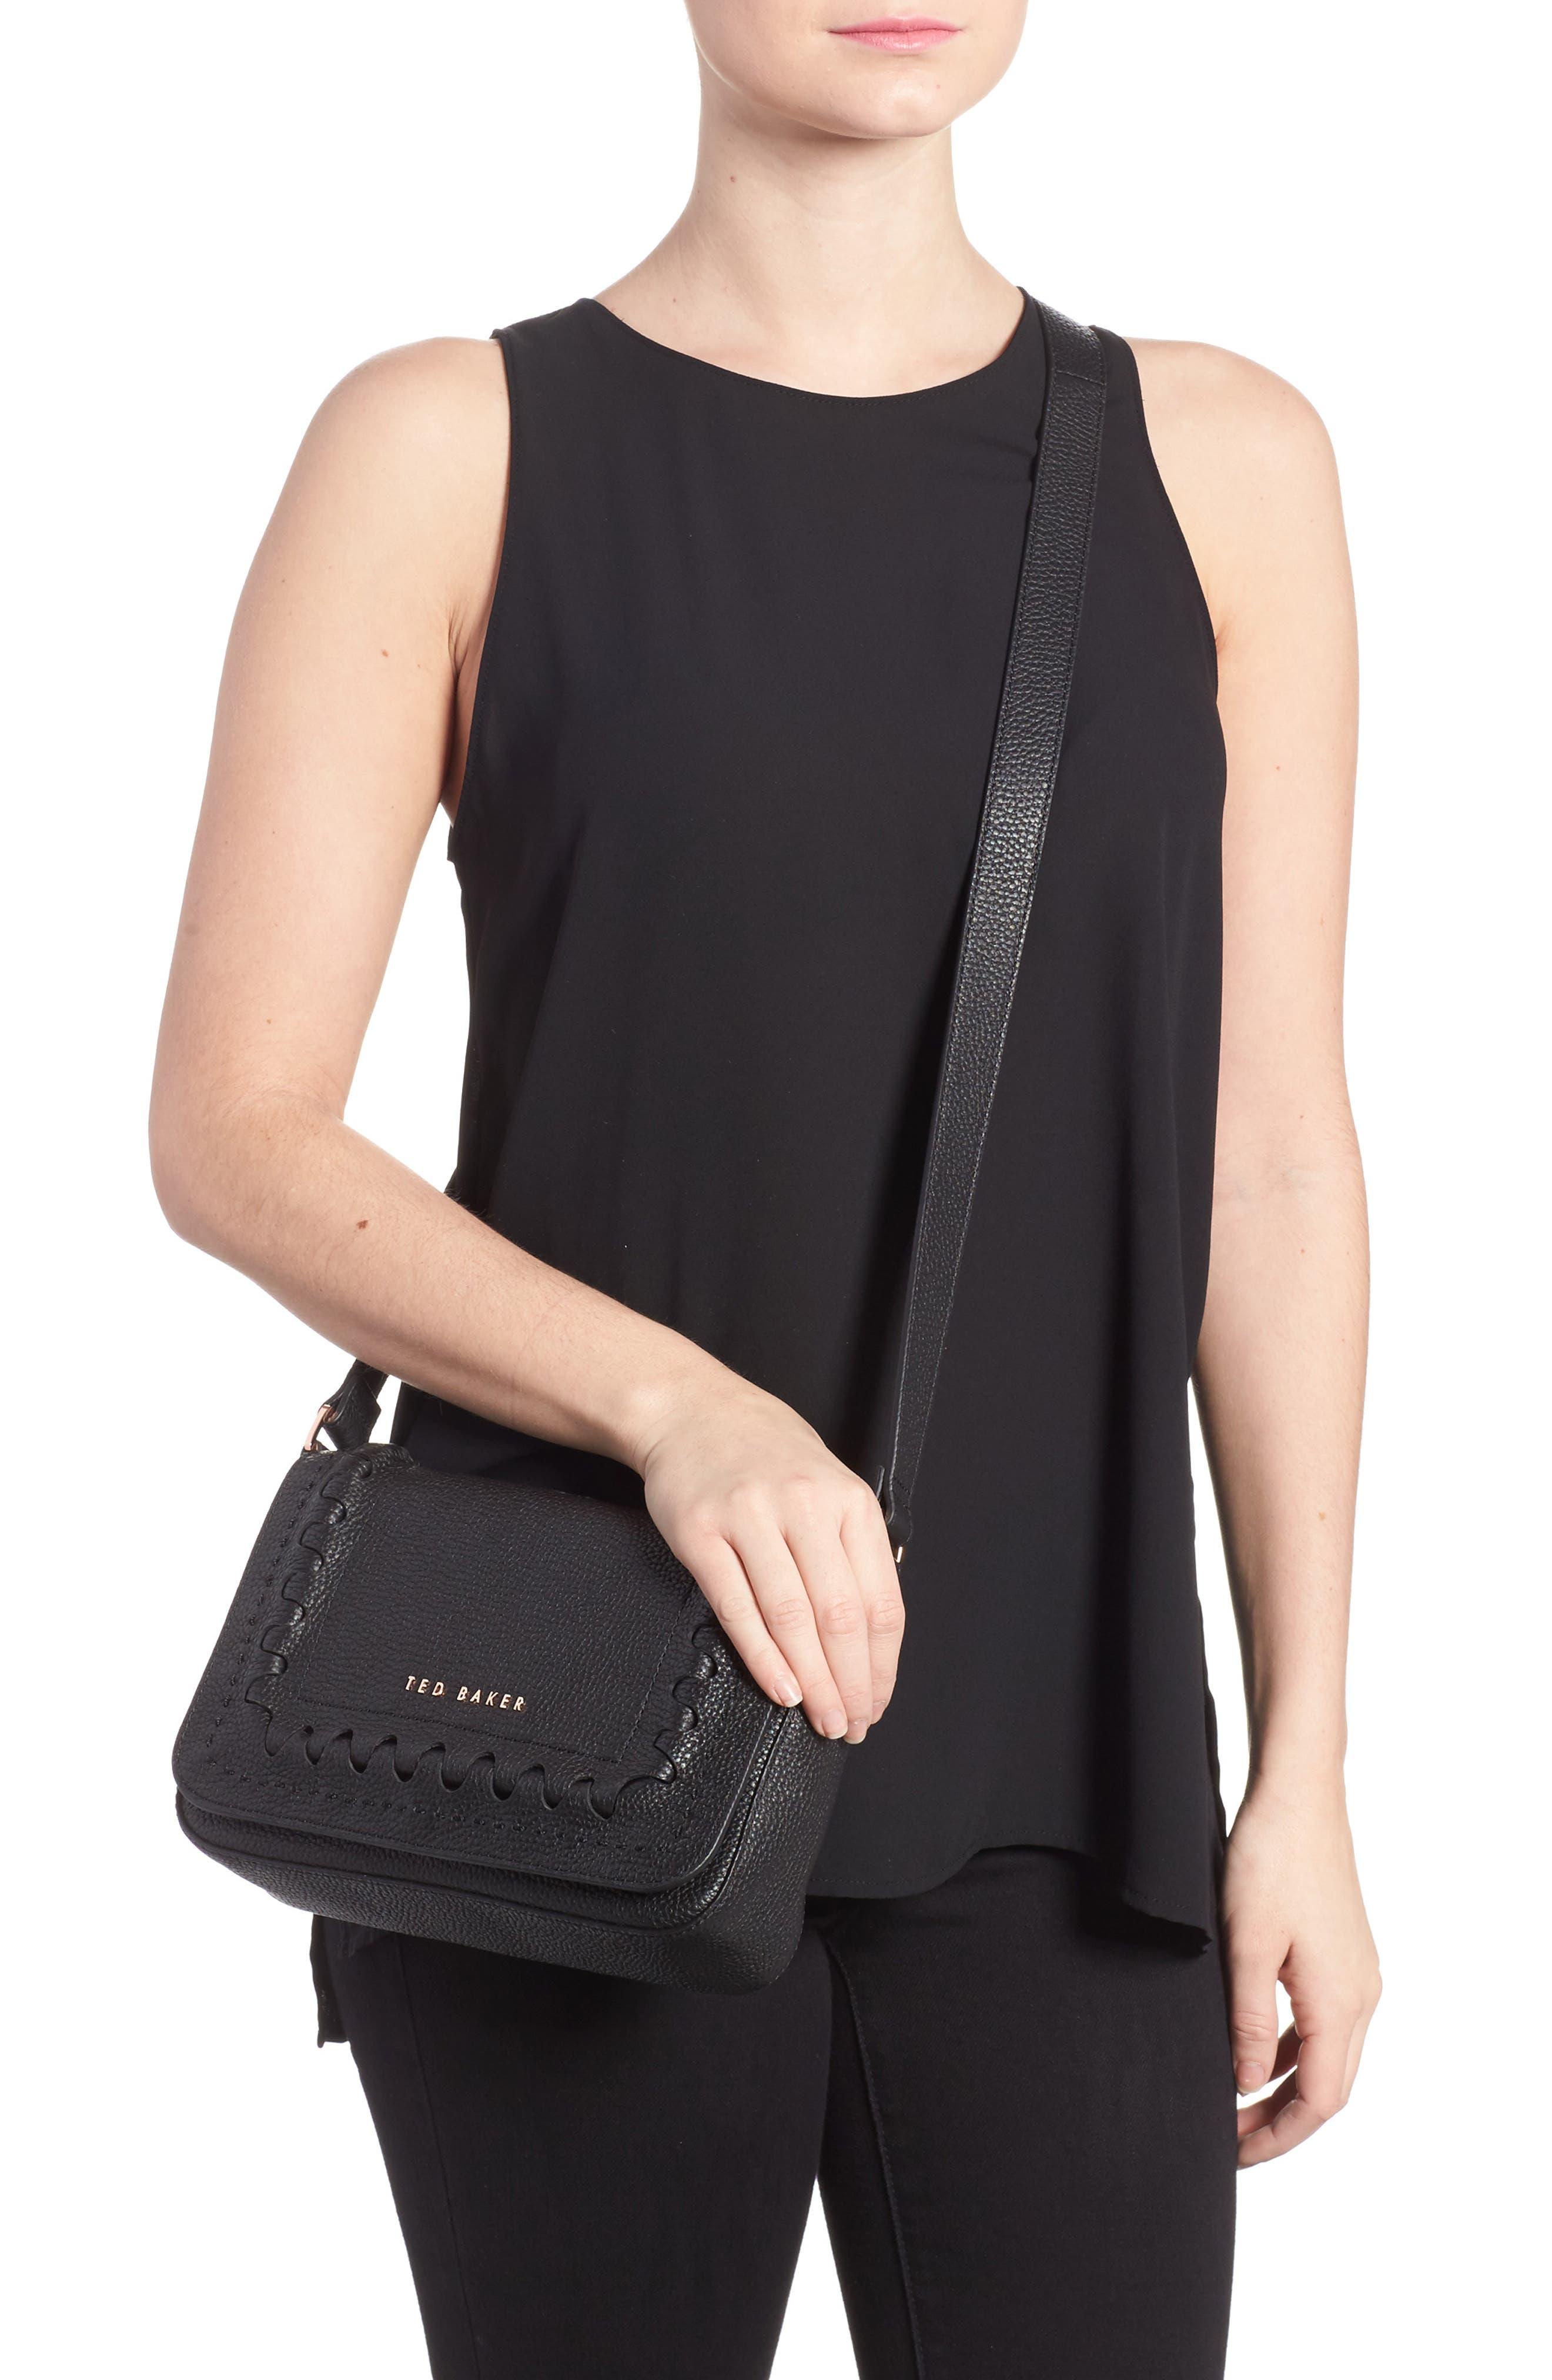 Tippi Leather Crossbody Bag,                             Alternate thumbnail 4, color,